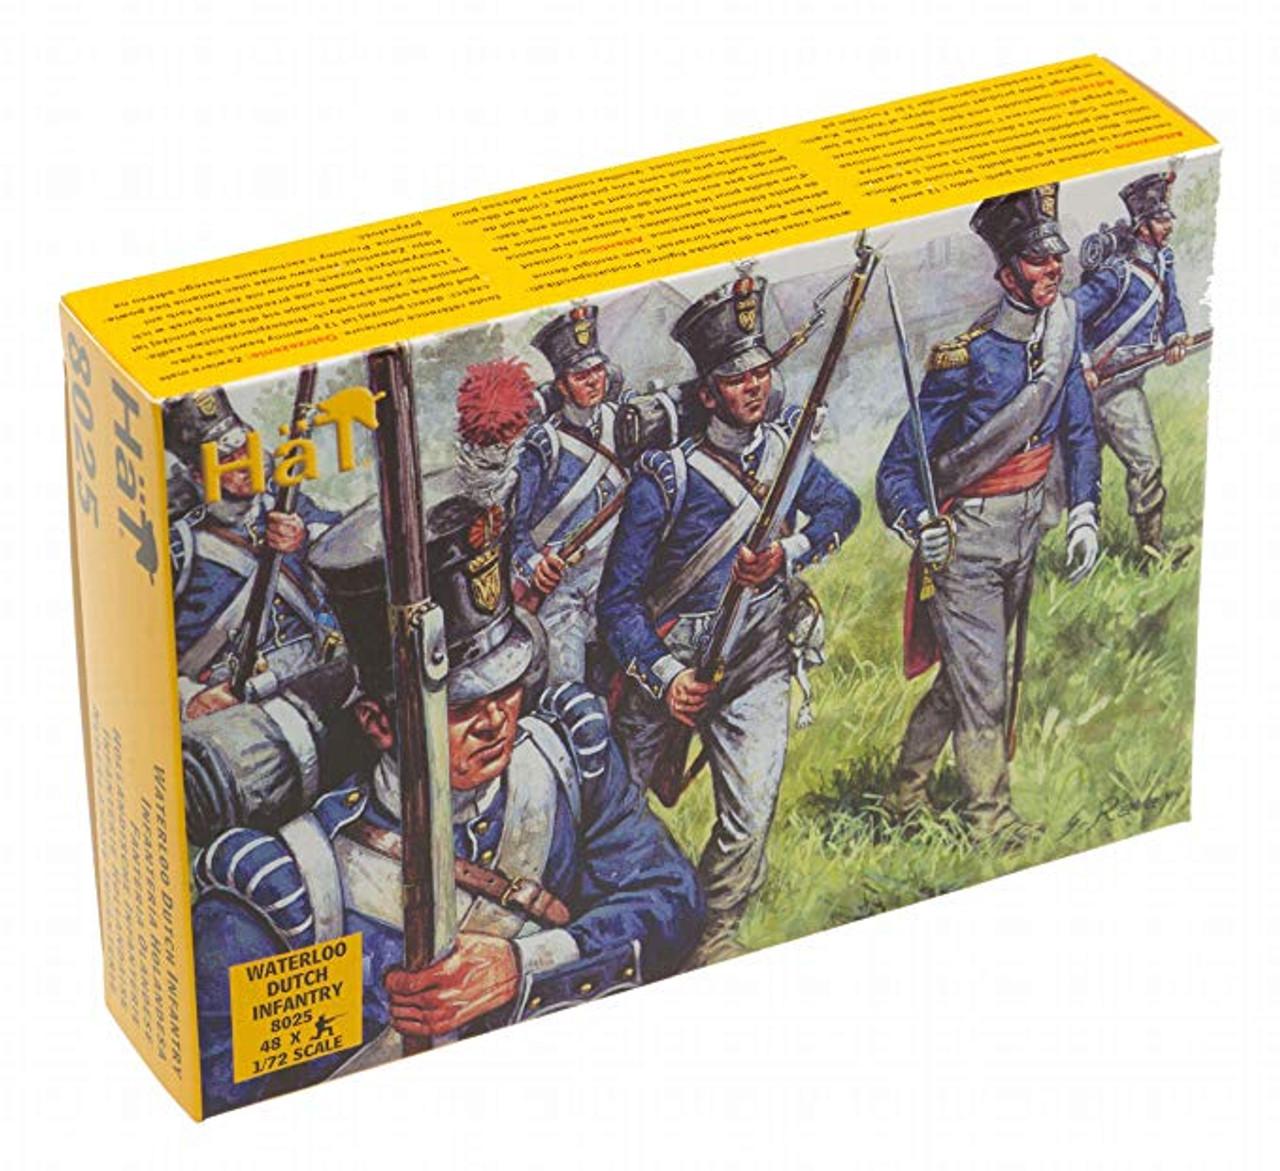 HaT 8025 Waterloo Dutch Infantry Figures 1:72 Scale